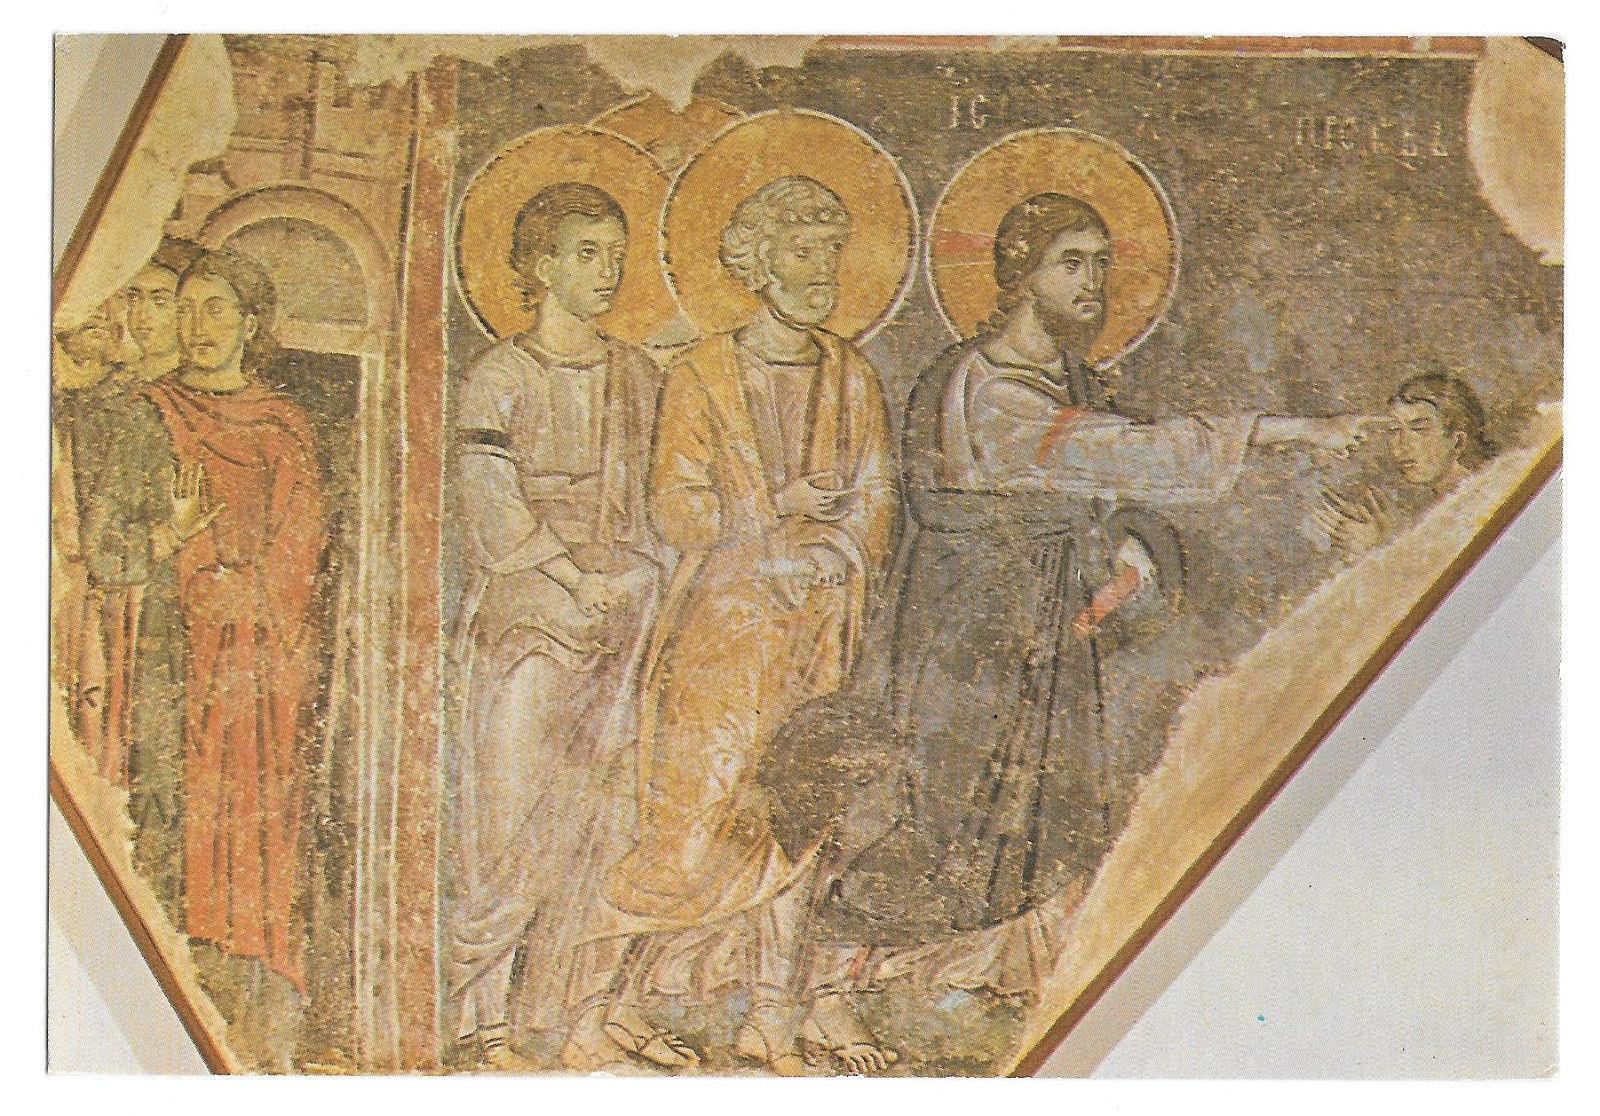 Christ Healing the Blind Serbia Bogorodica Church Fresco Vtg Art Postcard 4X6